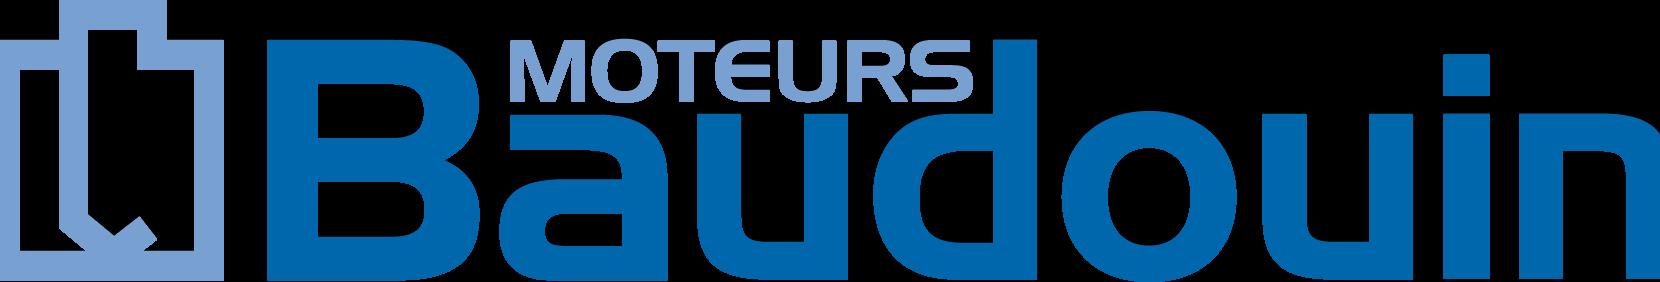 Baudouin logo -Genrep Canadian distributorship